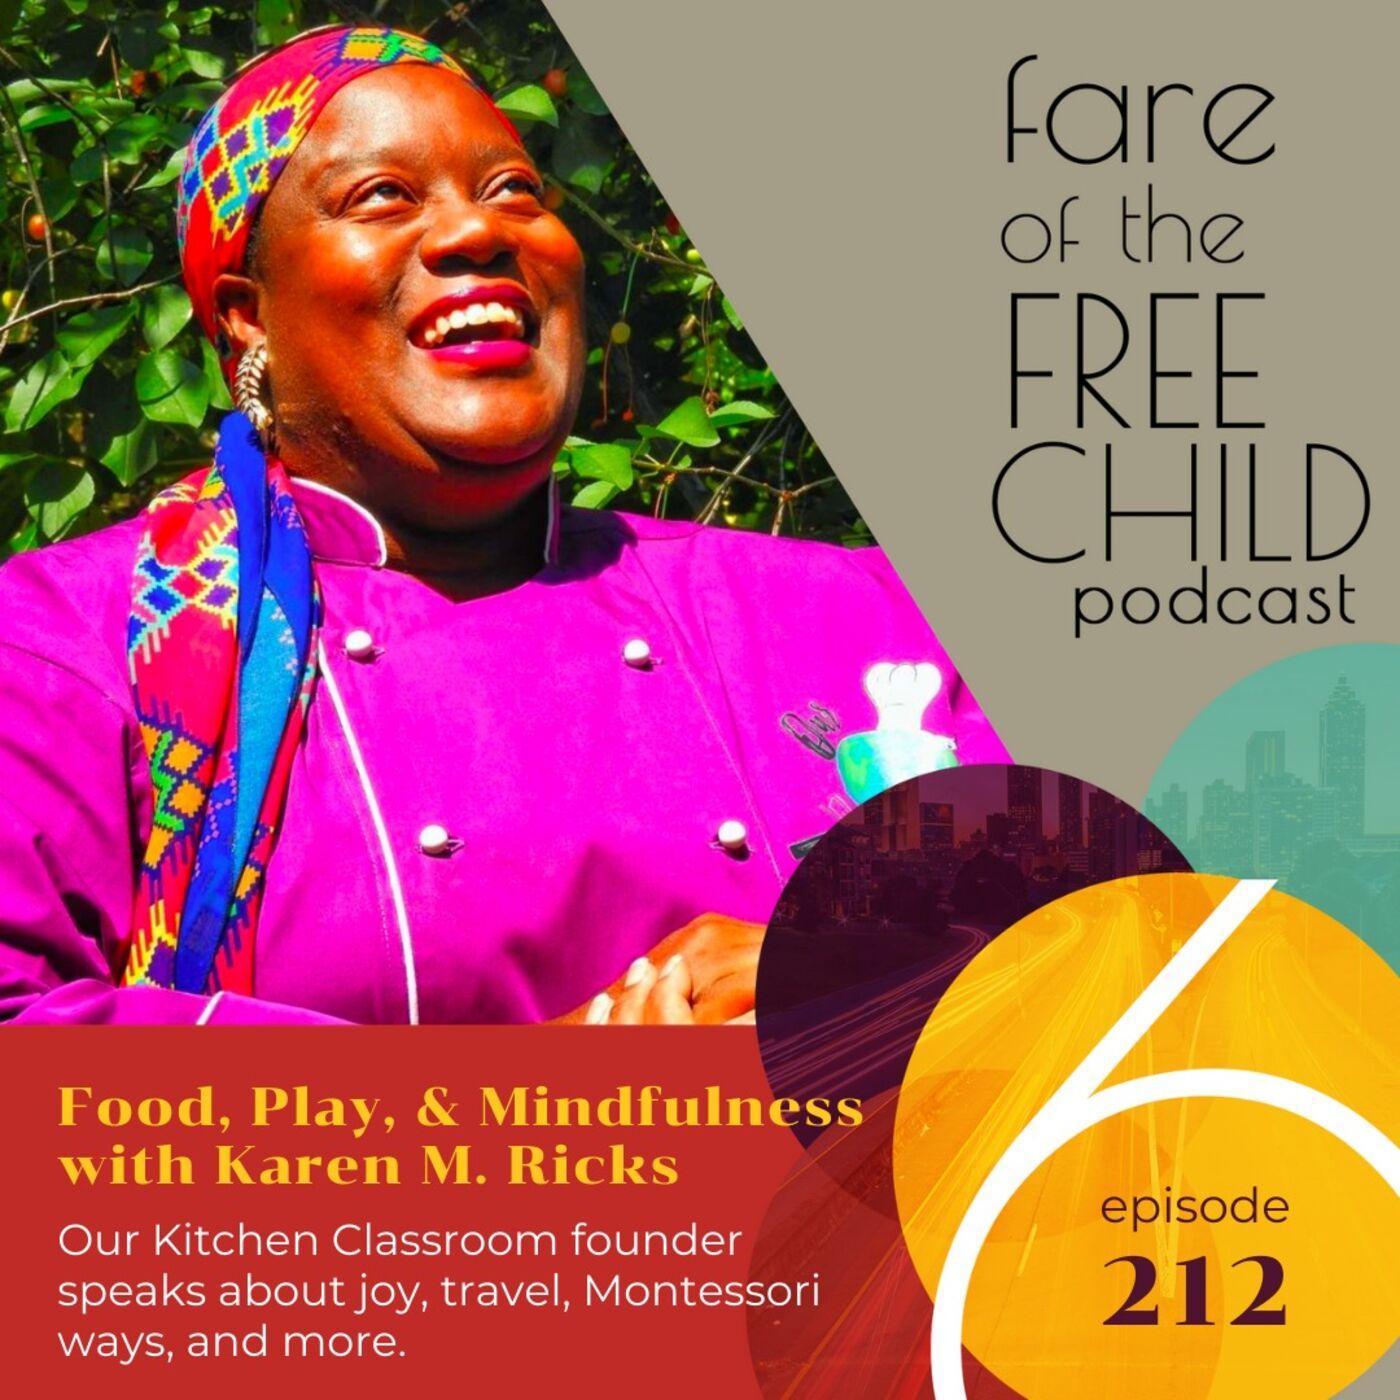 Ep 212: Food, Play, & Mindfulness with Karen M. Ricks